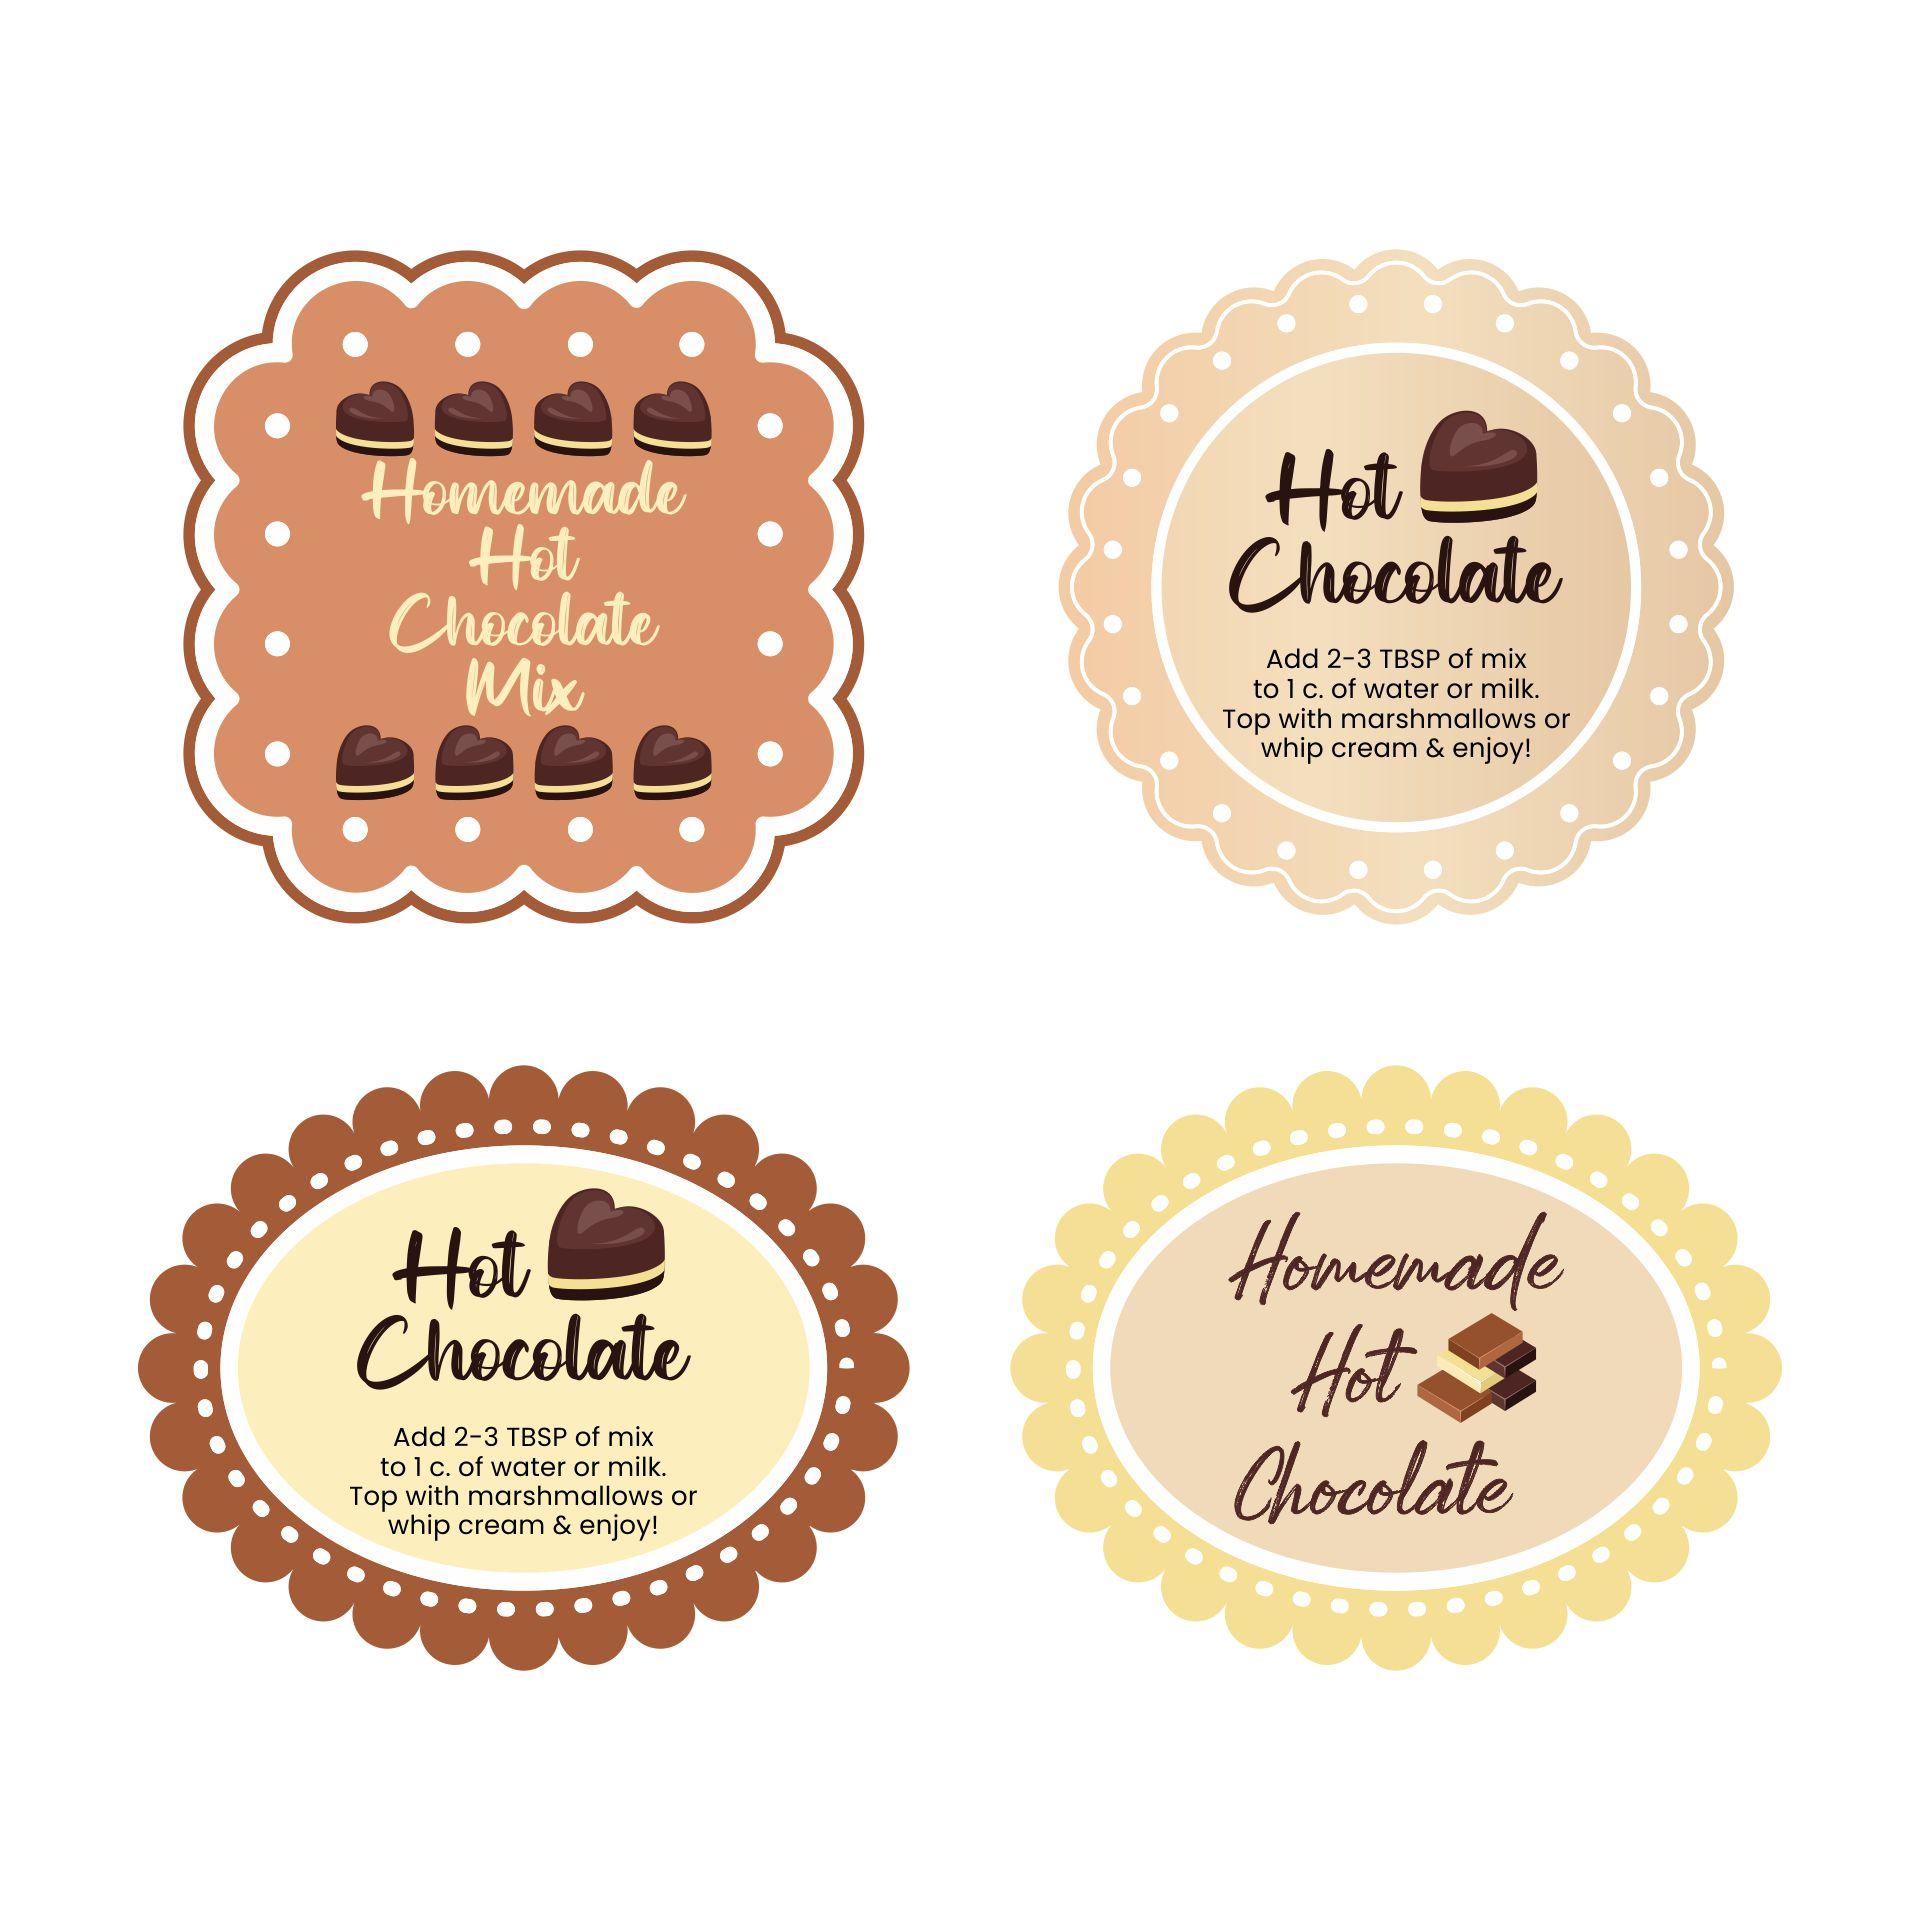 Homemade Hot Chocolate Label